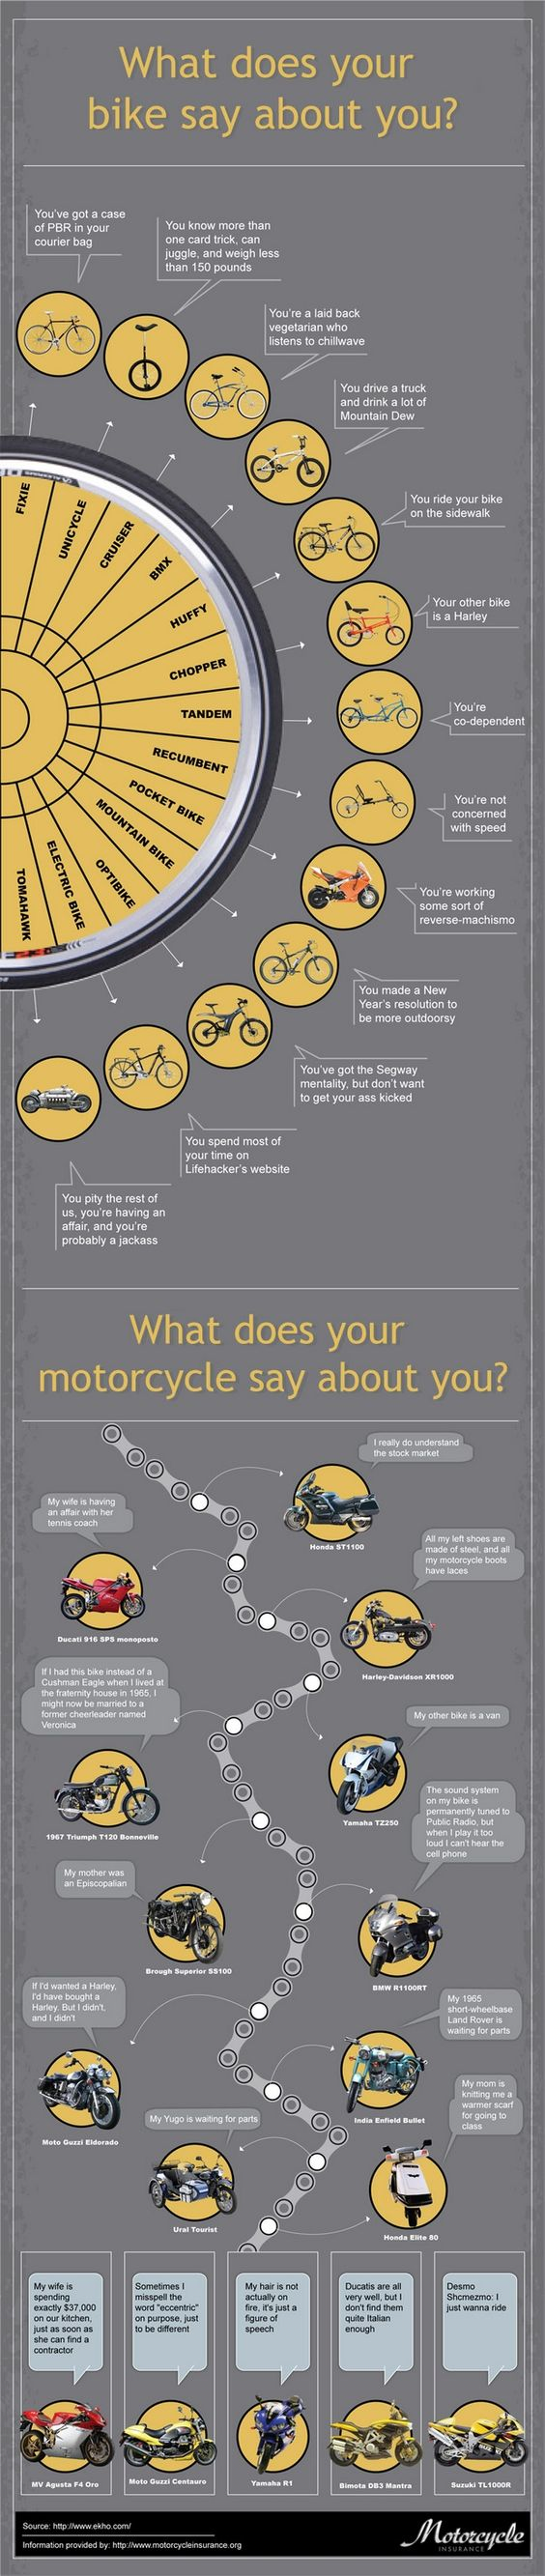 #Motorcycle #Motorbike #Infographic